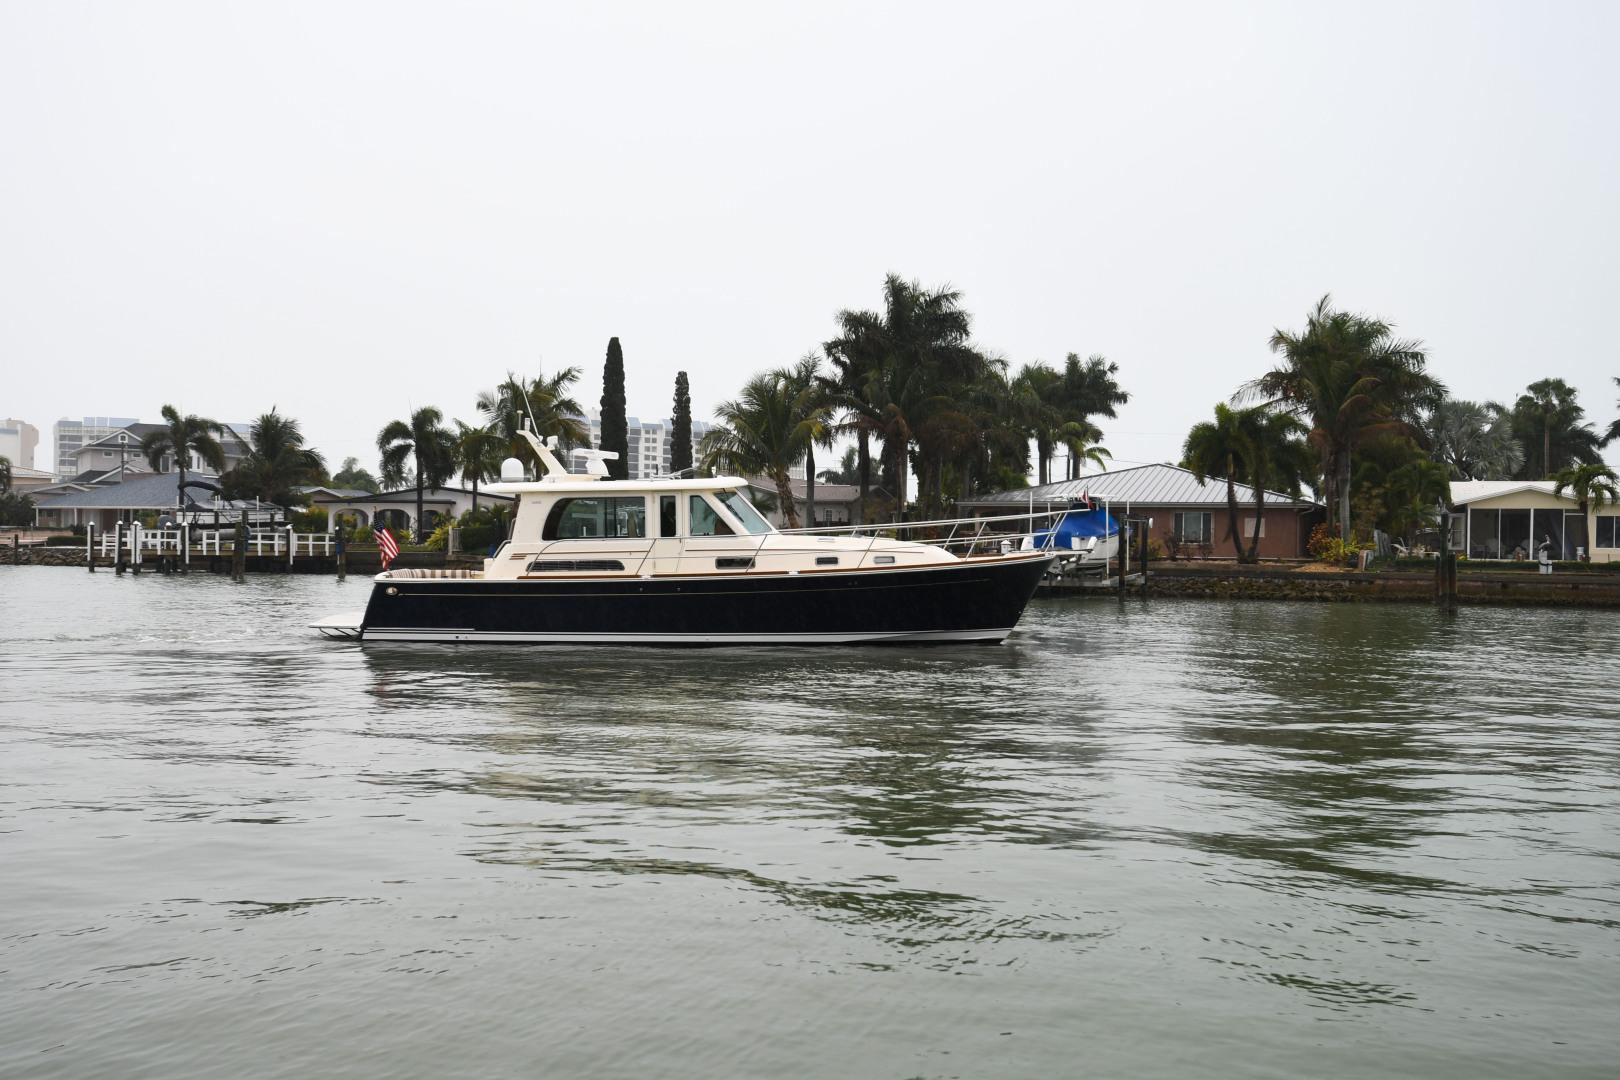 Sabre-40 Express 2010-Impulse Treasure Island-Florida-United States-2010 40 Sabre Express  Impulse  Profile-1618657 | Thumbnail